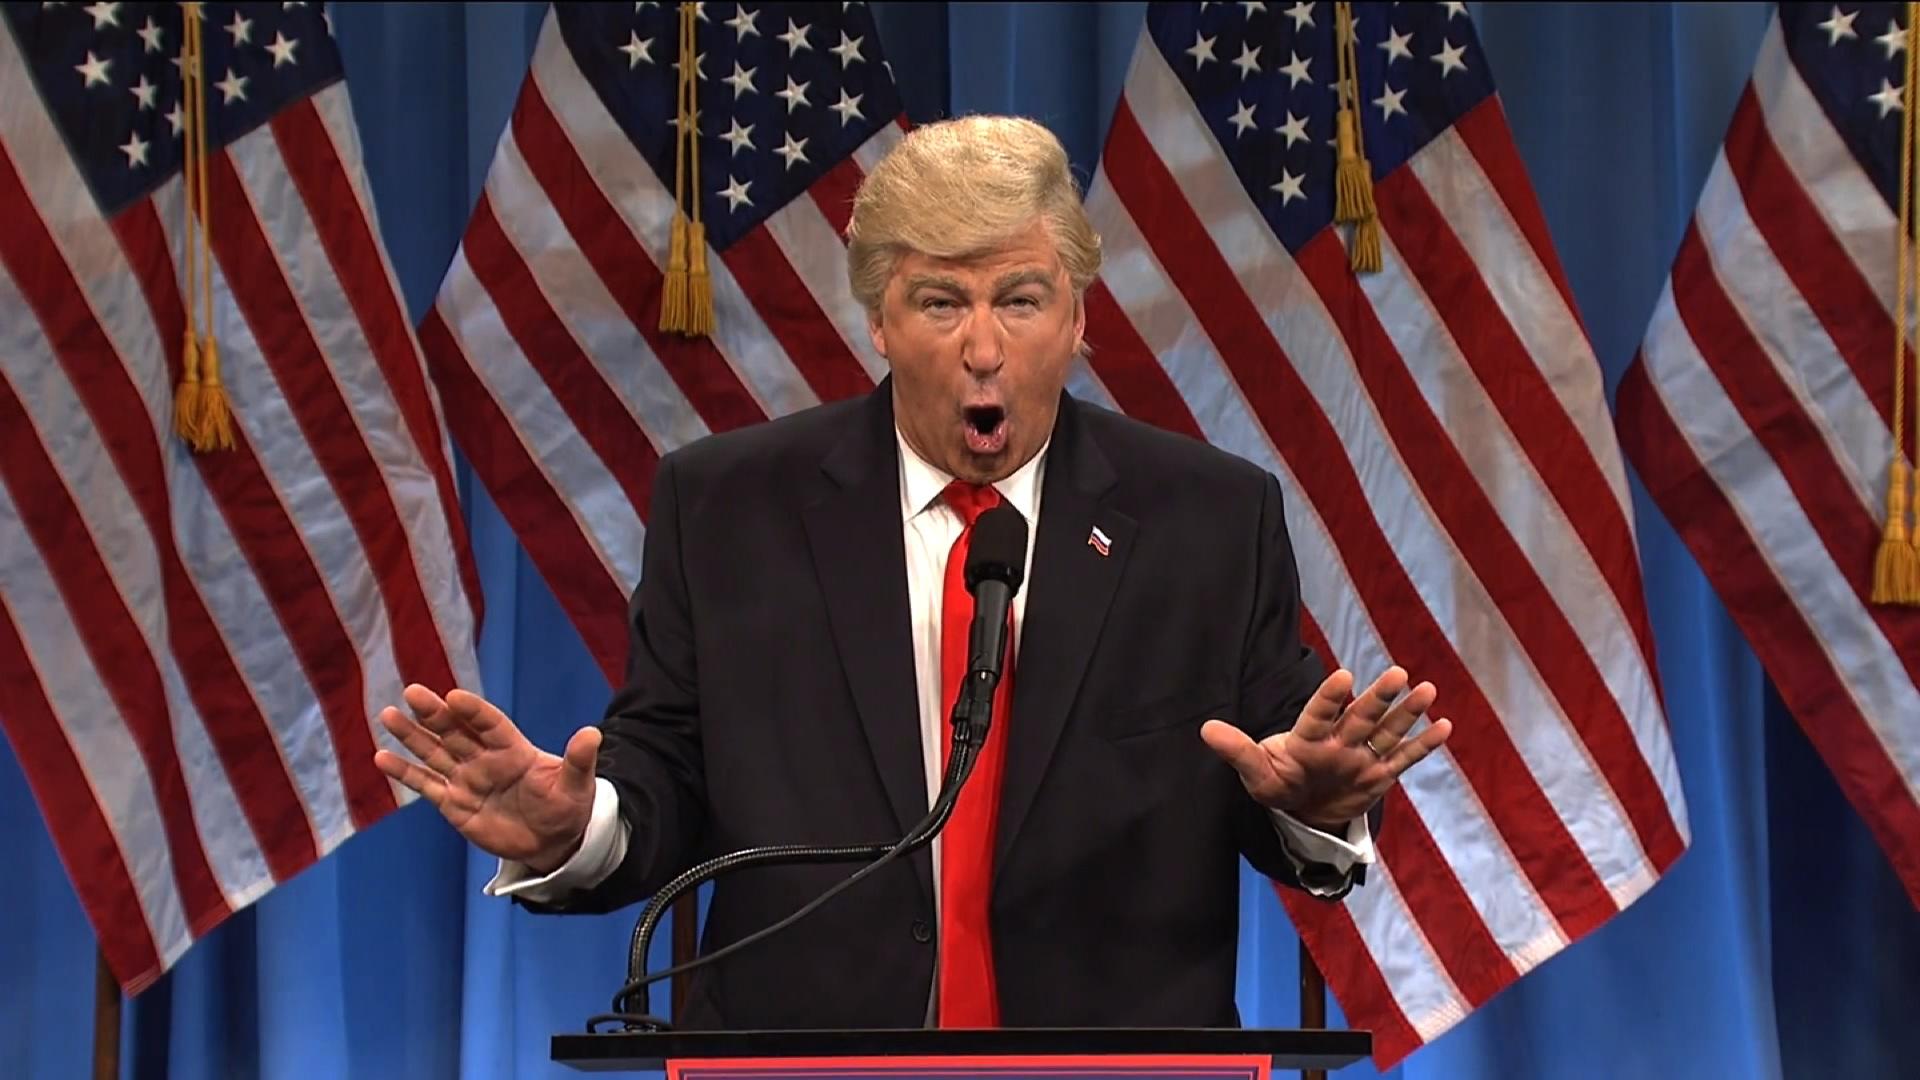 SNL' mocks Trump's press conference - CNN Video